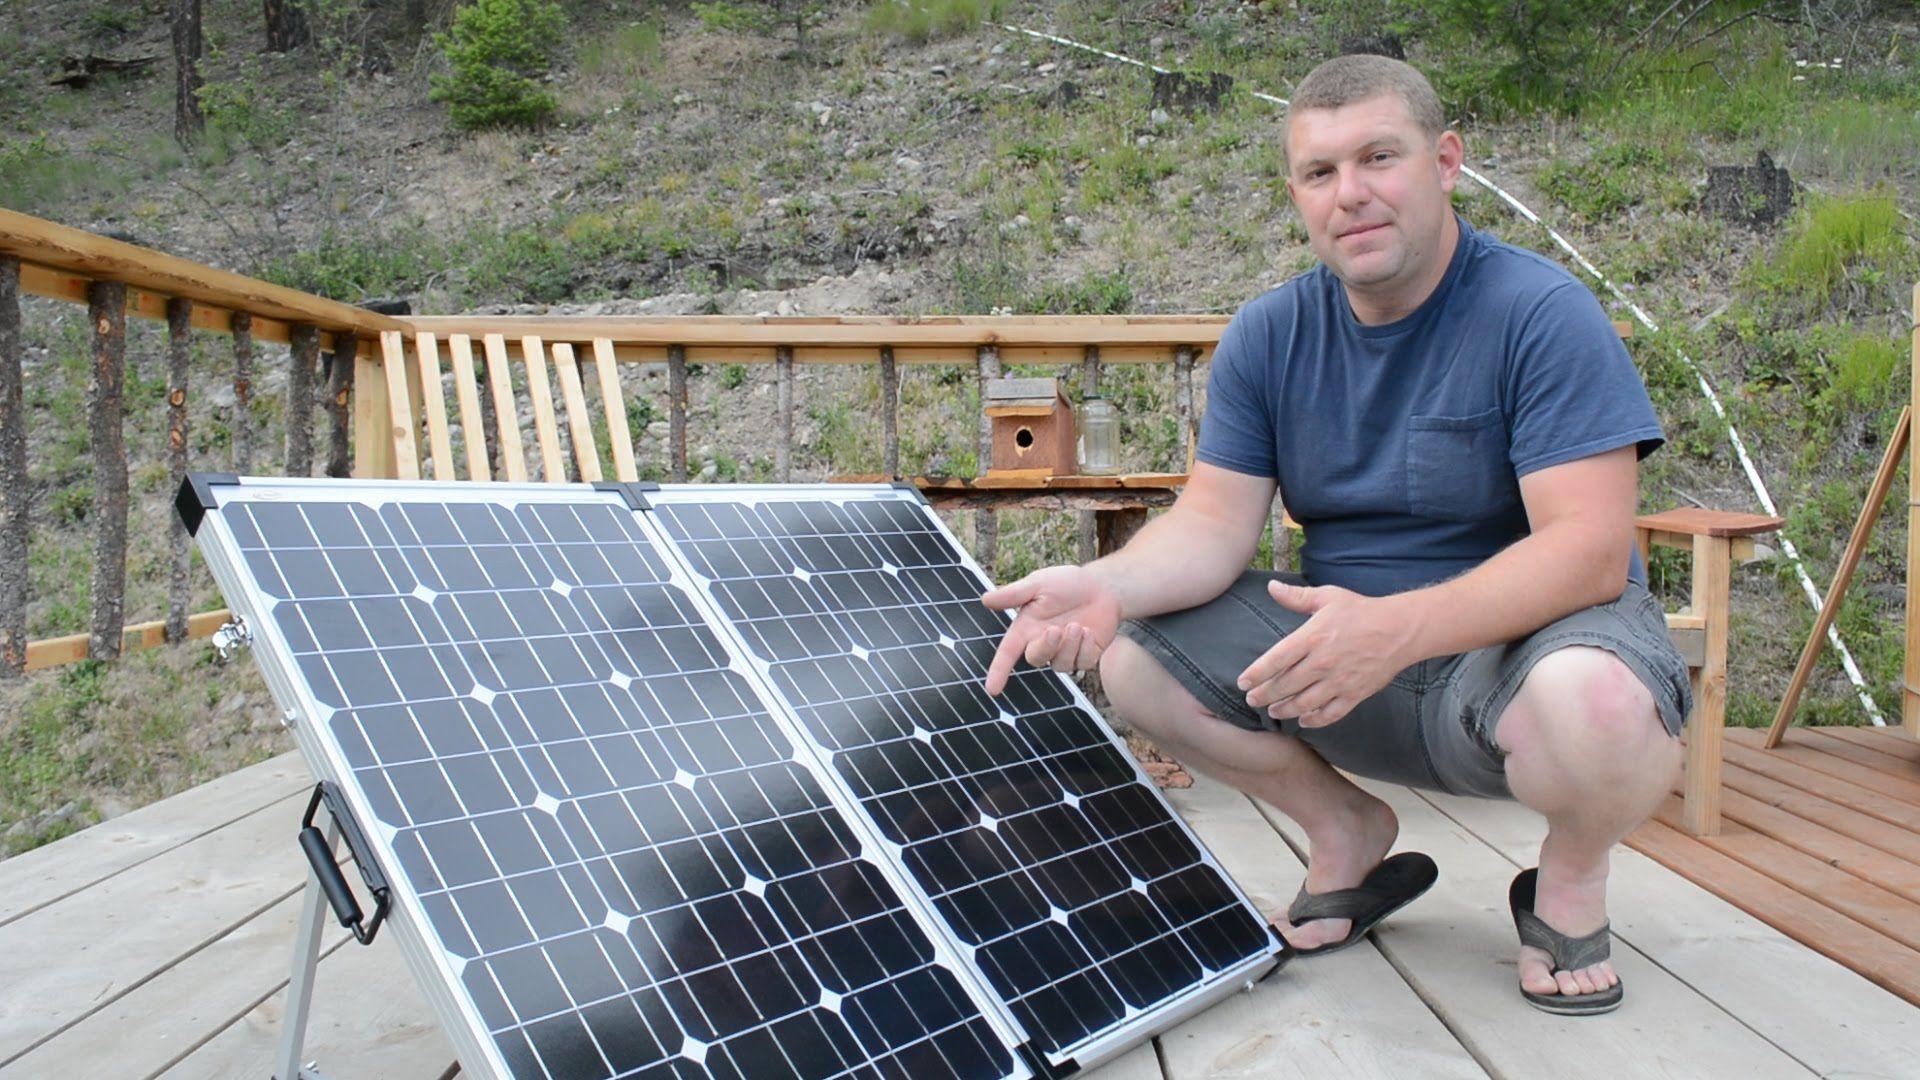 Stupid Easy Portable Solar Panels For Rv Off Grid And Camping Portable Solar Panels Solar Panels Best Solar Panels